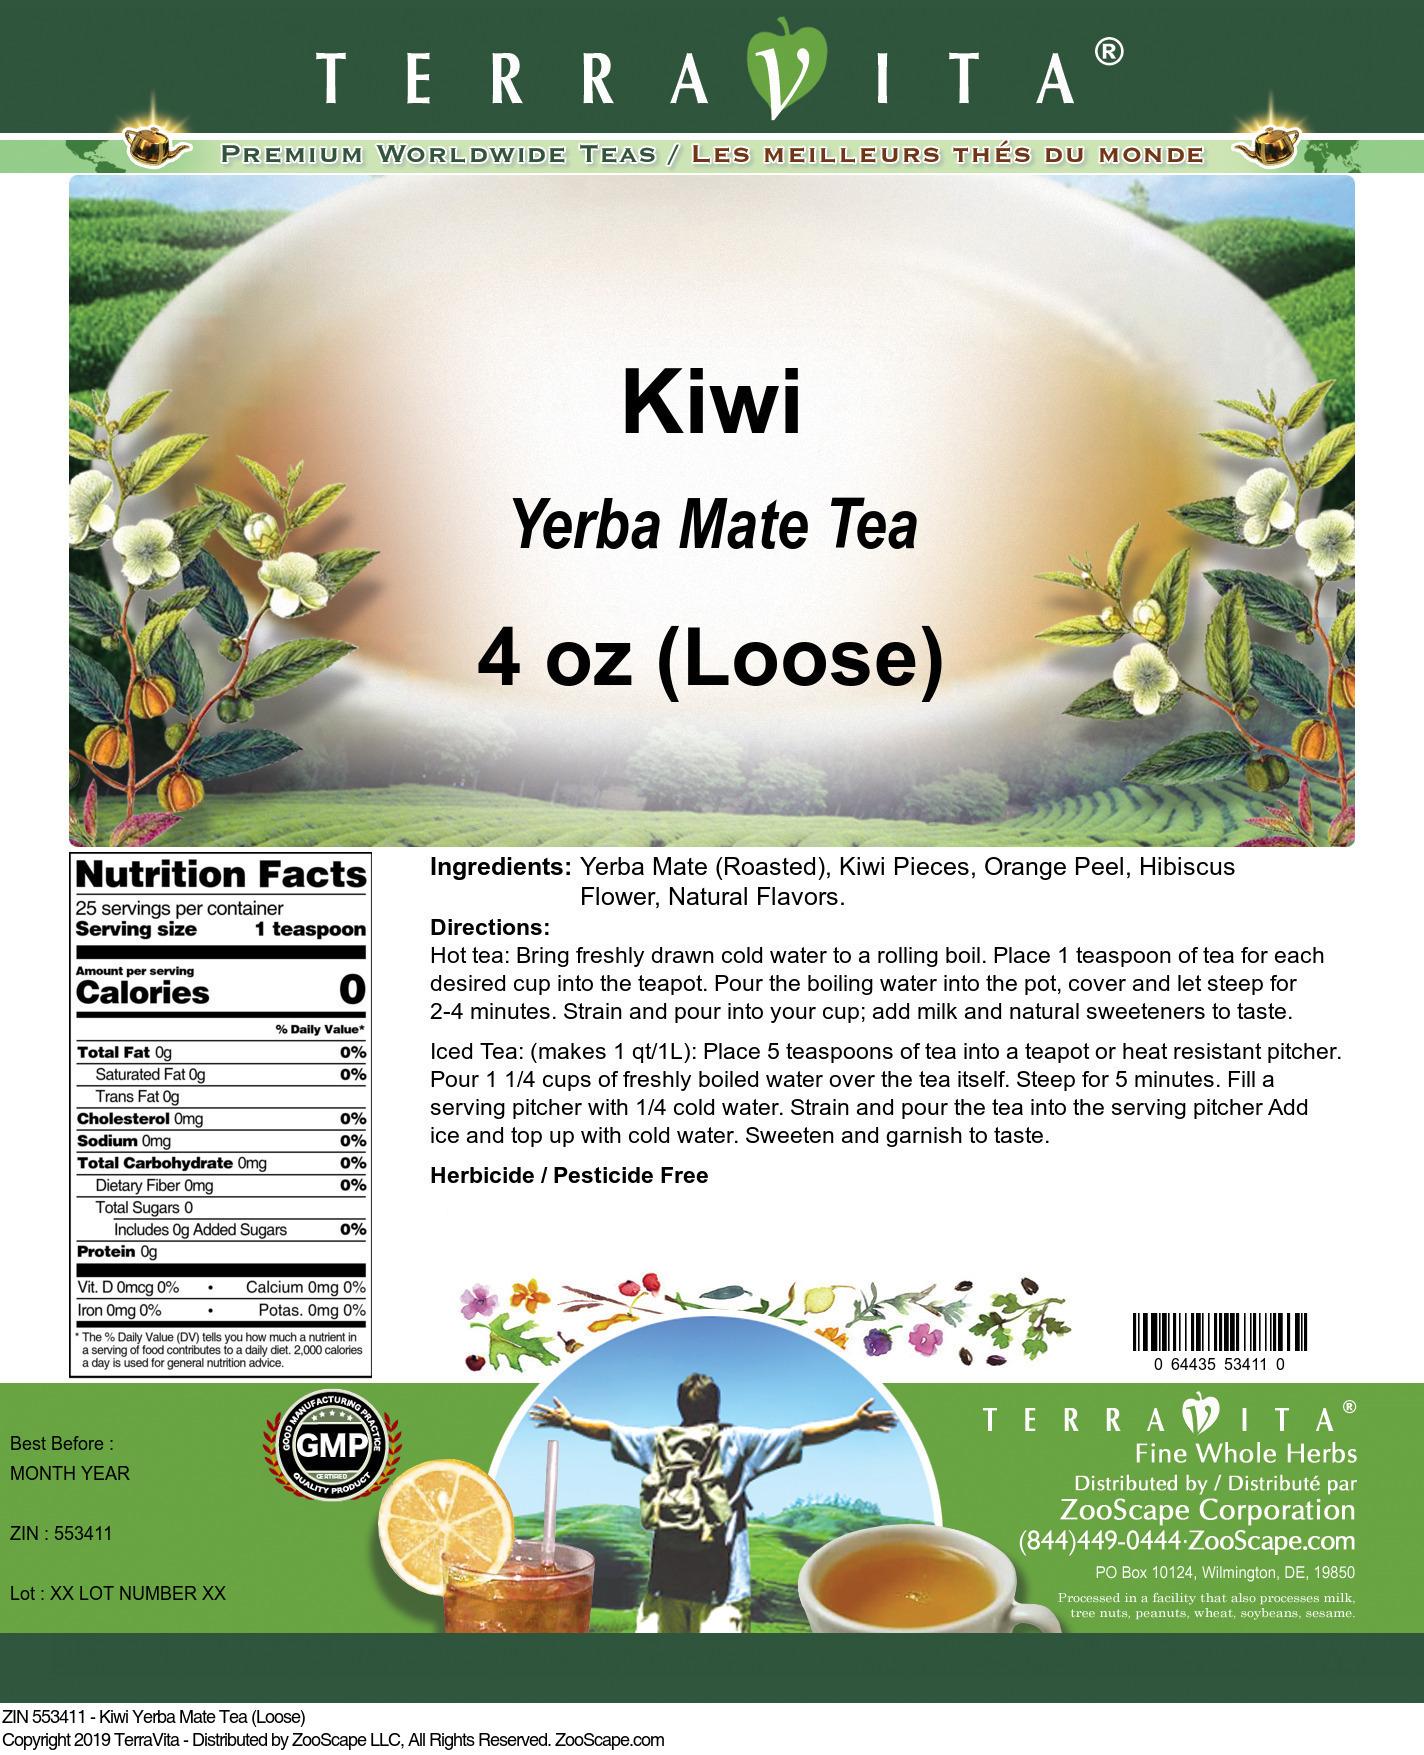 Kiwi Yerba Mate Tea (Loose)